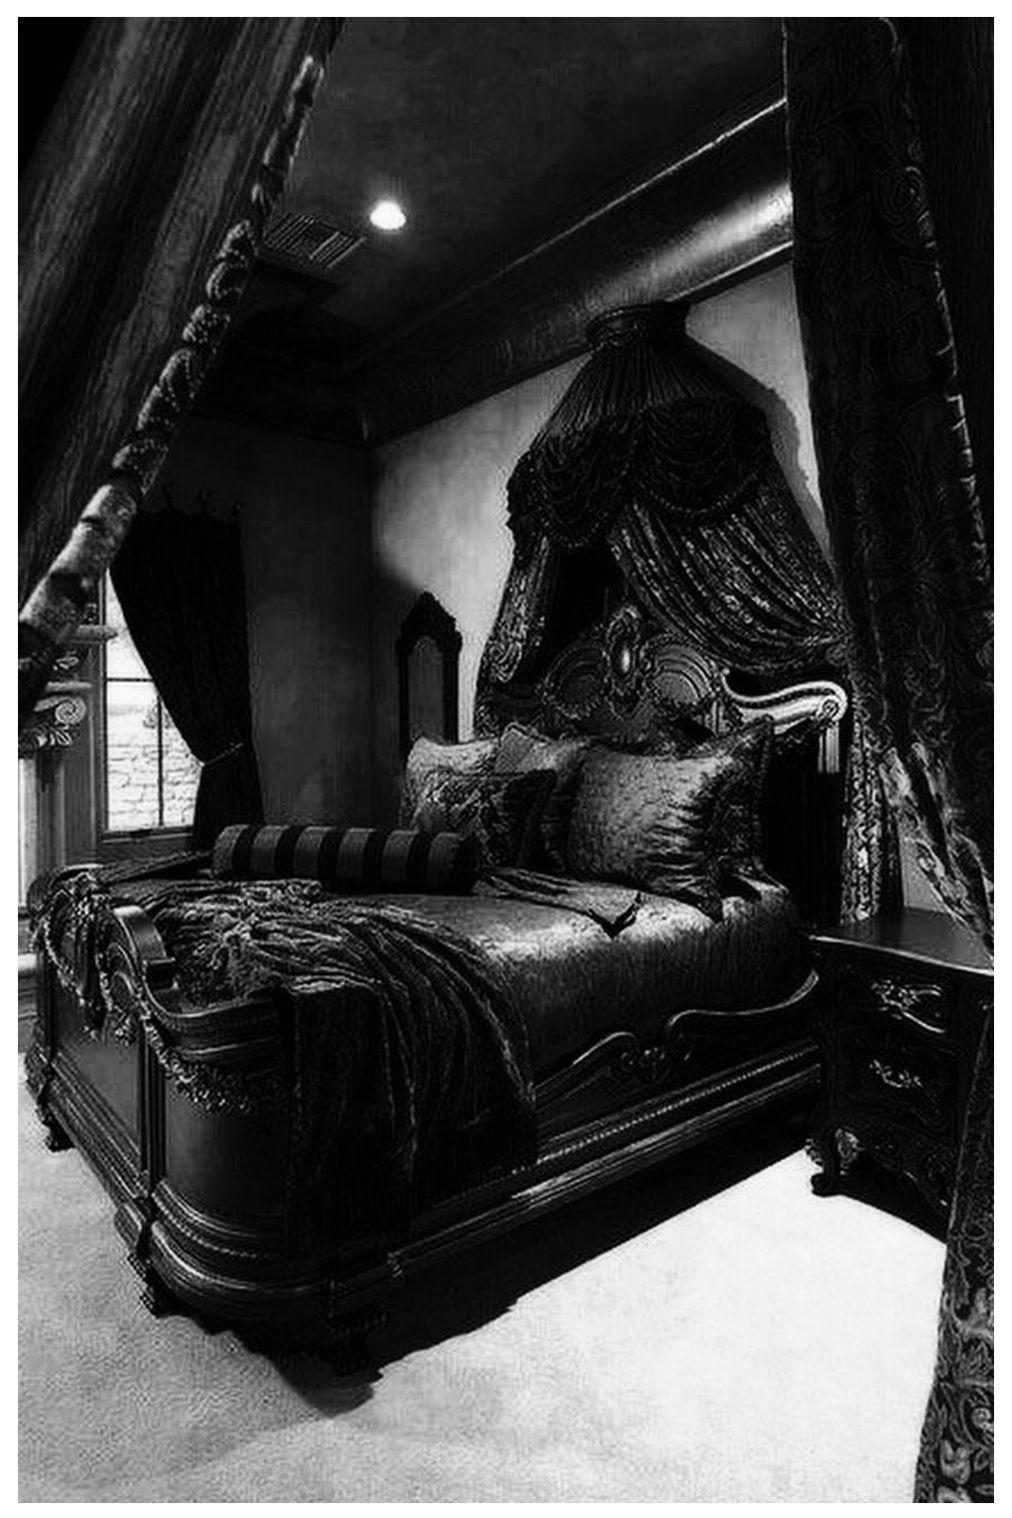 Gothic Bedroom Ideas 40 Stylish Design How To Decorate Black Bedroom Furniture Black Bedroom Furniture Set Gothic Bedroom